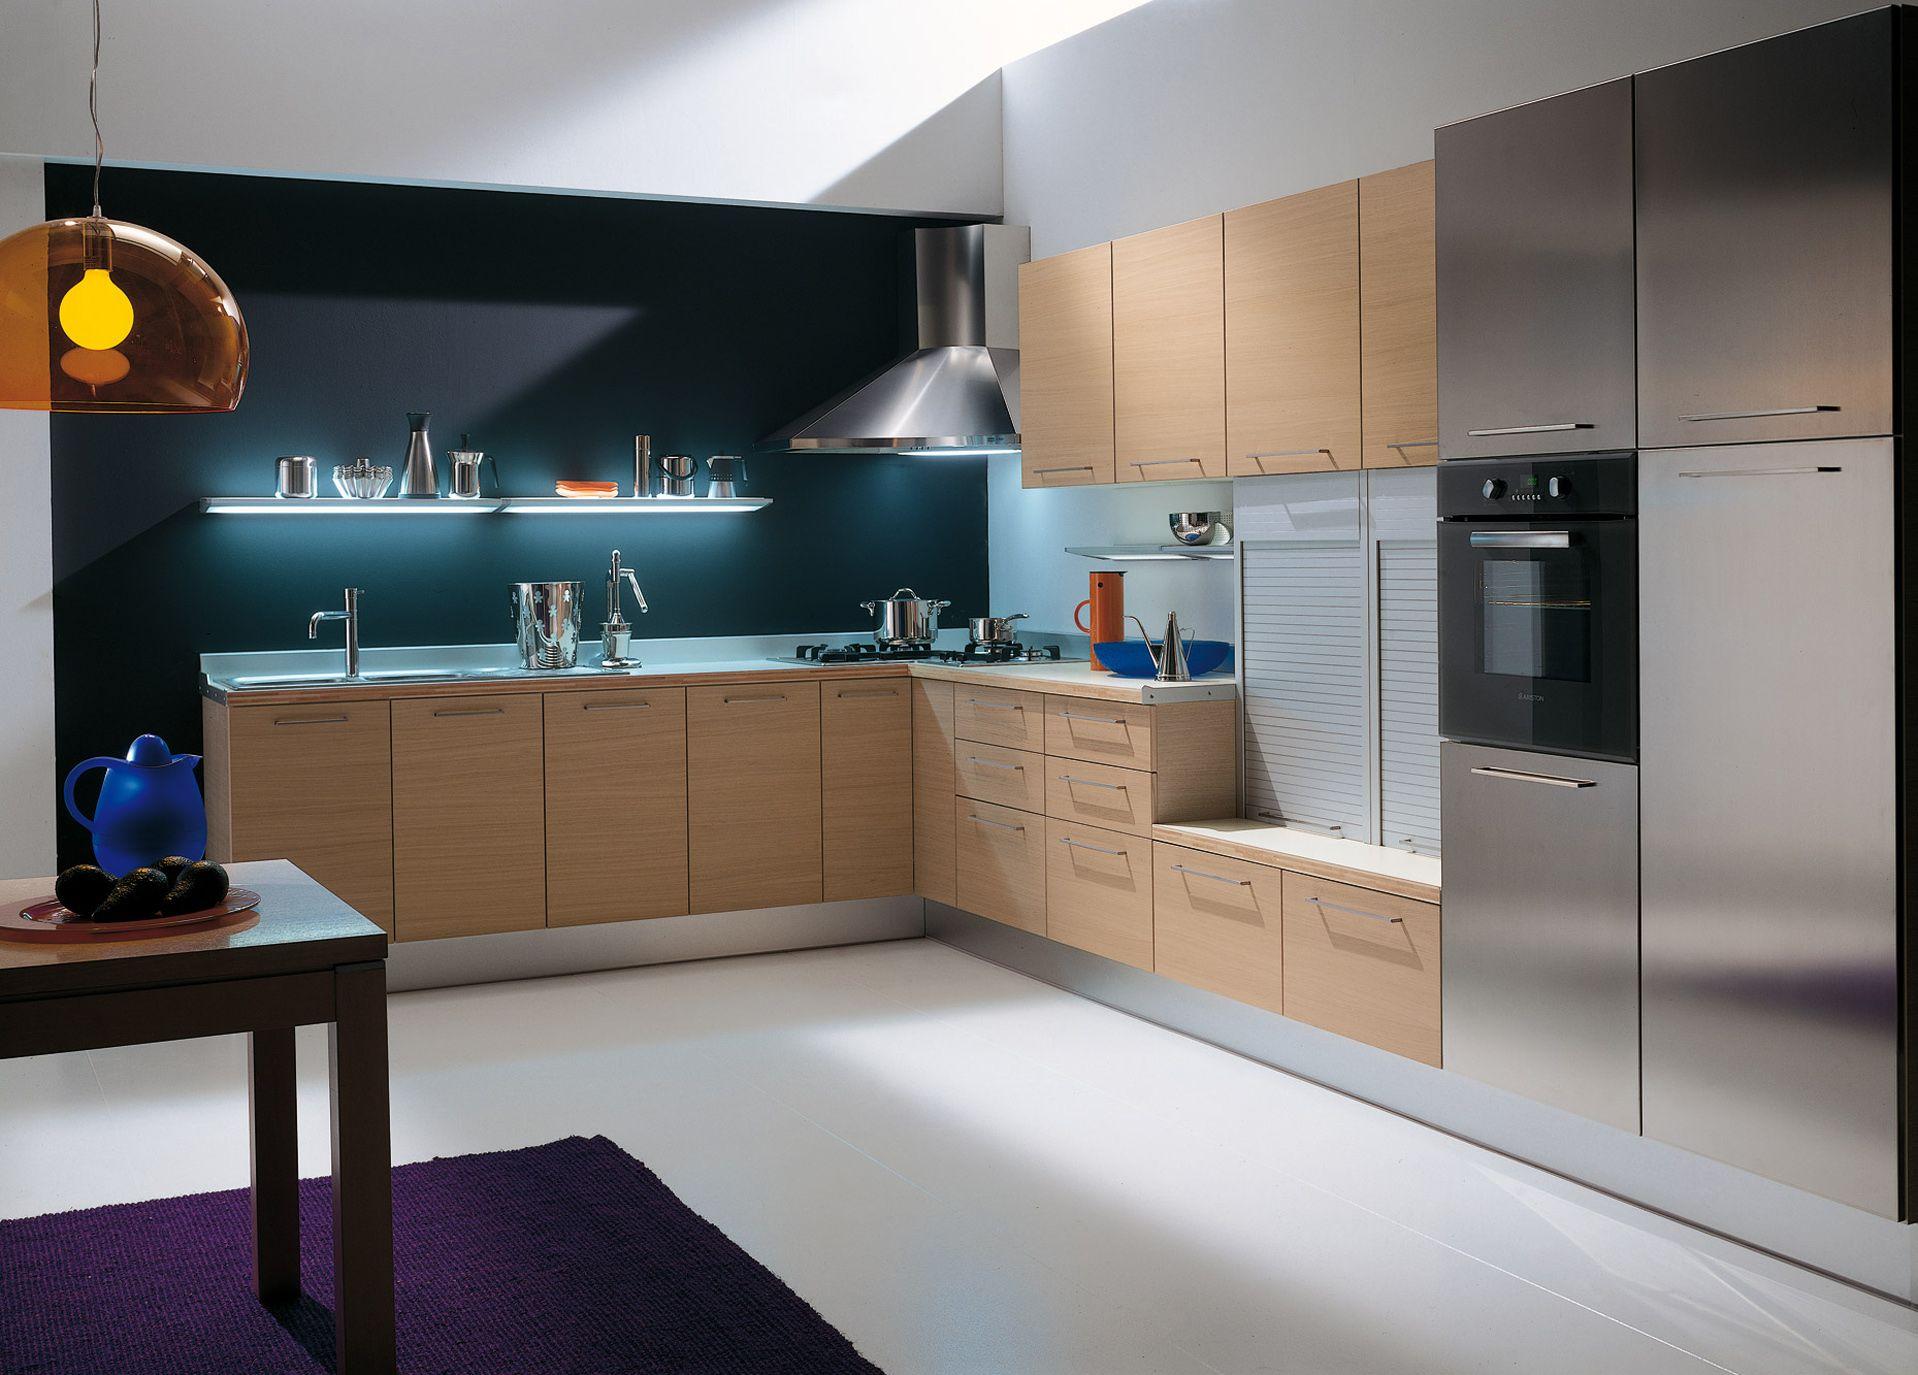 Vismap cucine cucine moderne contemporanee e classiche